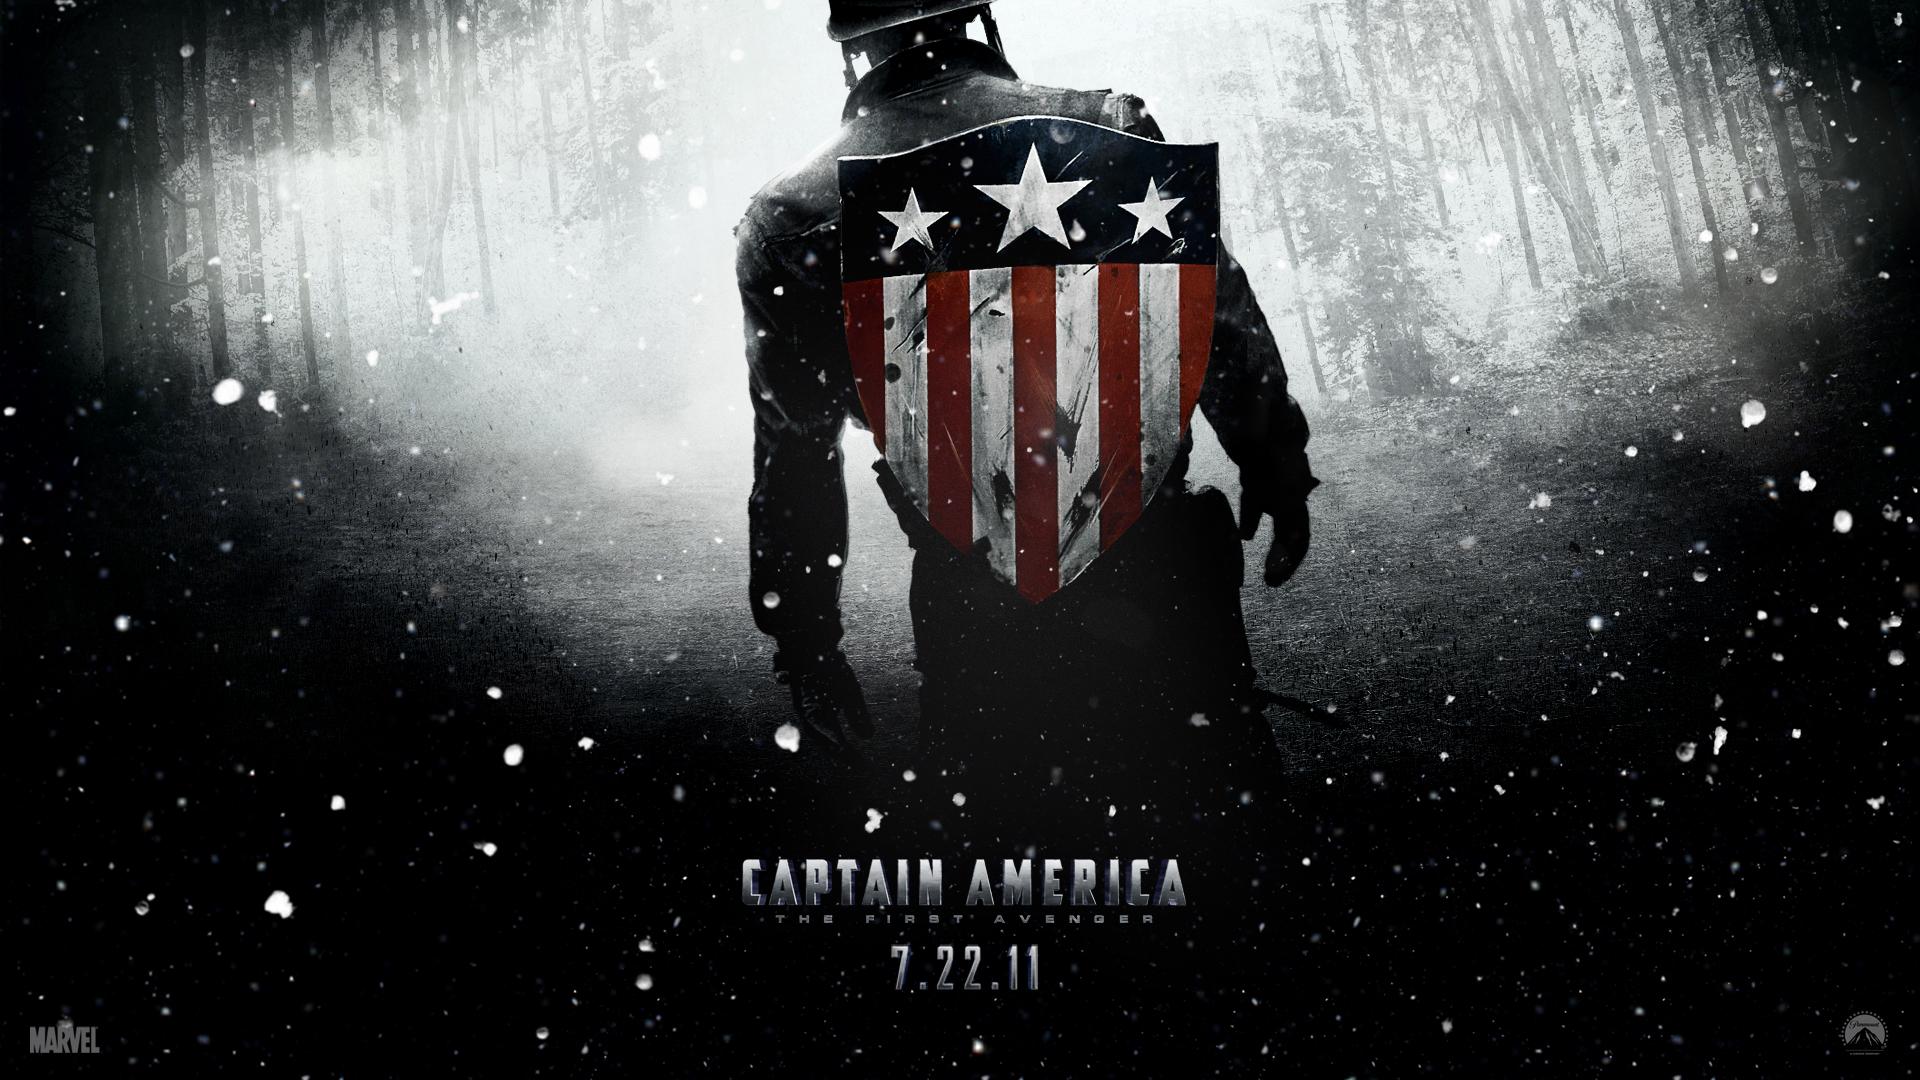 Captain america the first avenger hd wallpaper - Captain america screensaver download ...